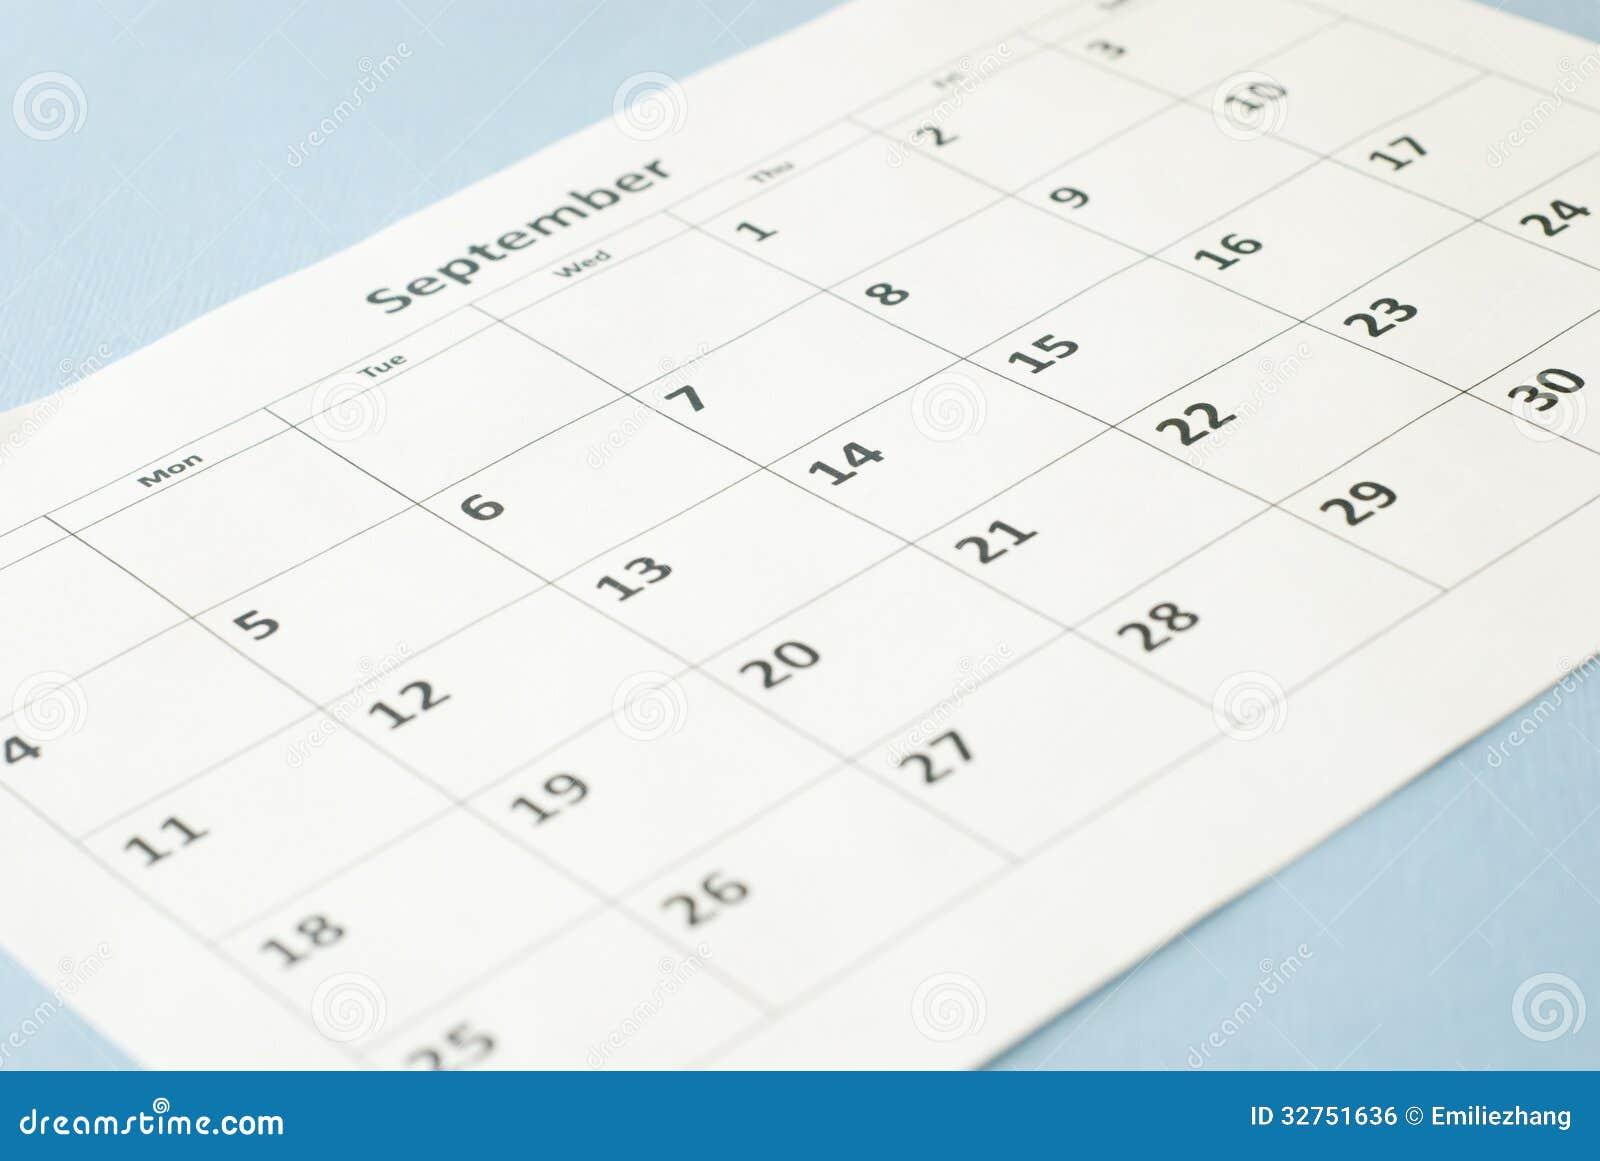 Calendar Background Images : Calendar stock photo image of white document background